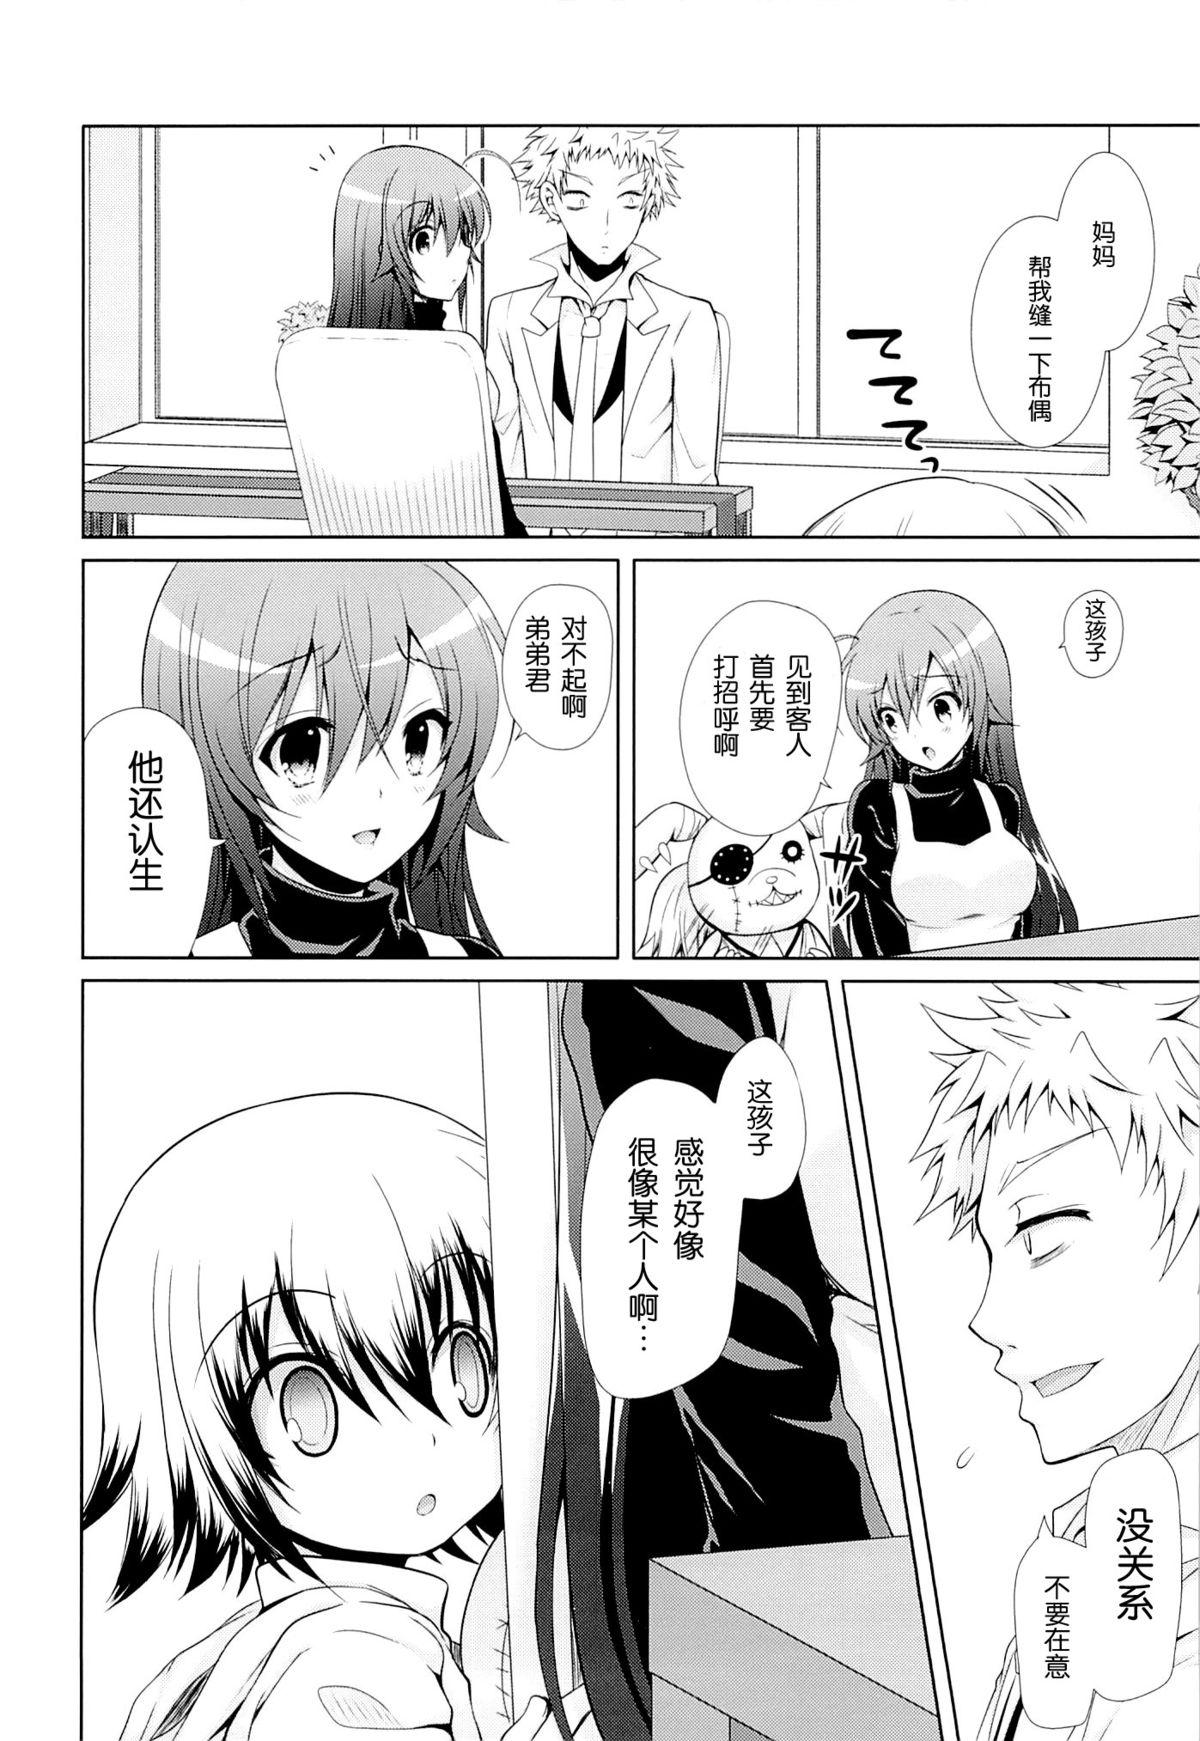 (C87) [Sugar*Berry*Syrup (Kuroe)] Hitozuma Medaka-chan (26) ga Kumagawa-kun ni NTR-reru Hon (Medaka Box) [Chinese] [脸肿汉化组] 27